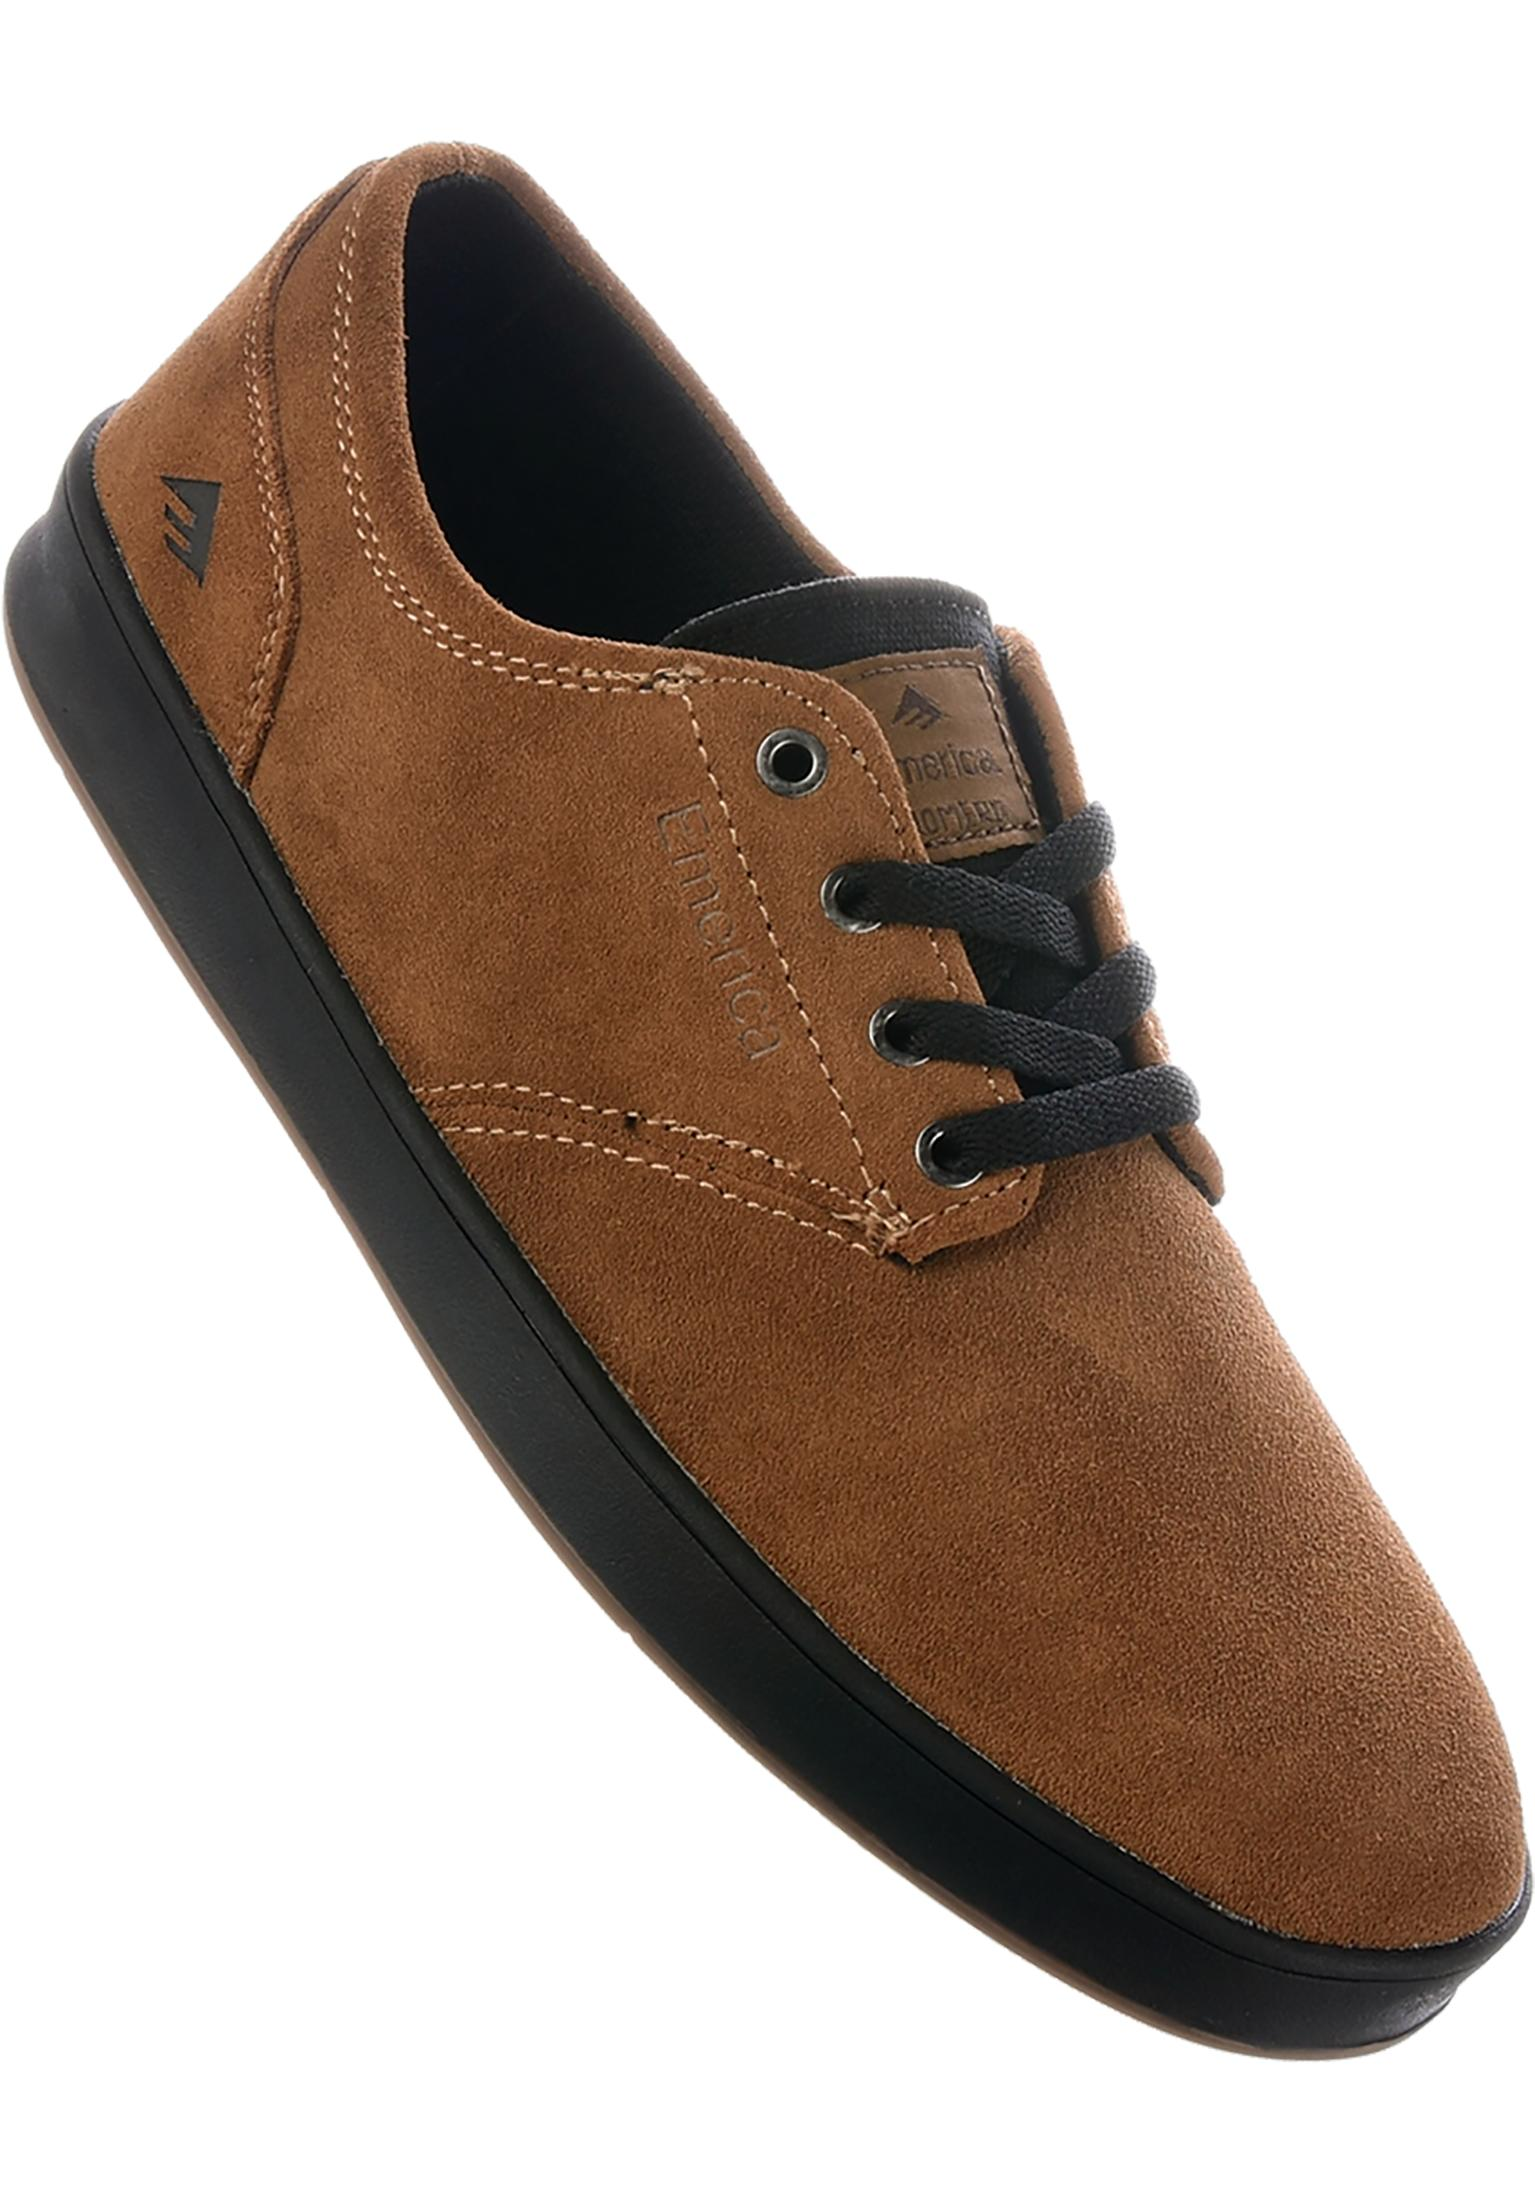 Skate Schuhe & Sneakers online kaufen     Titus